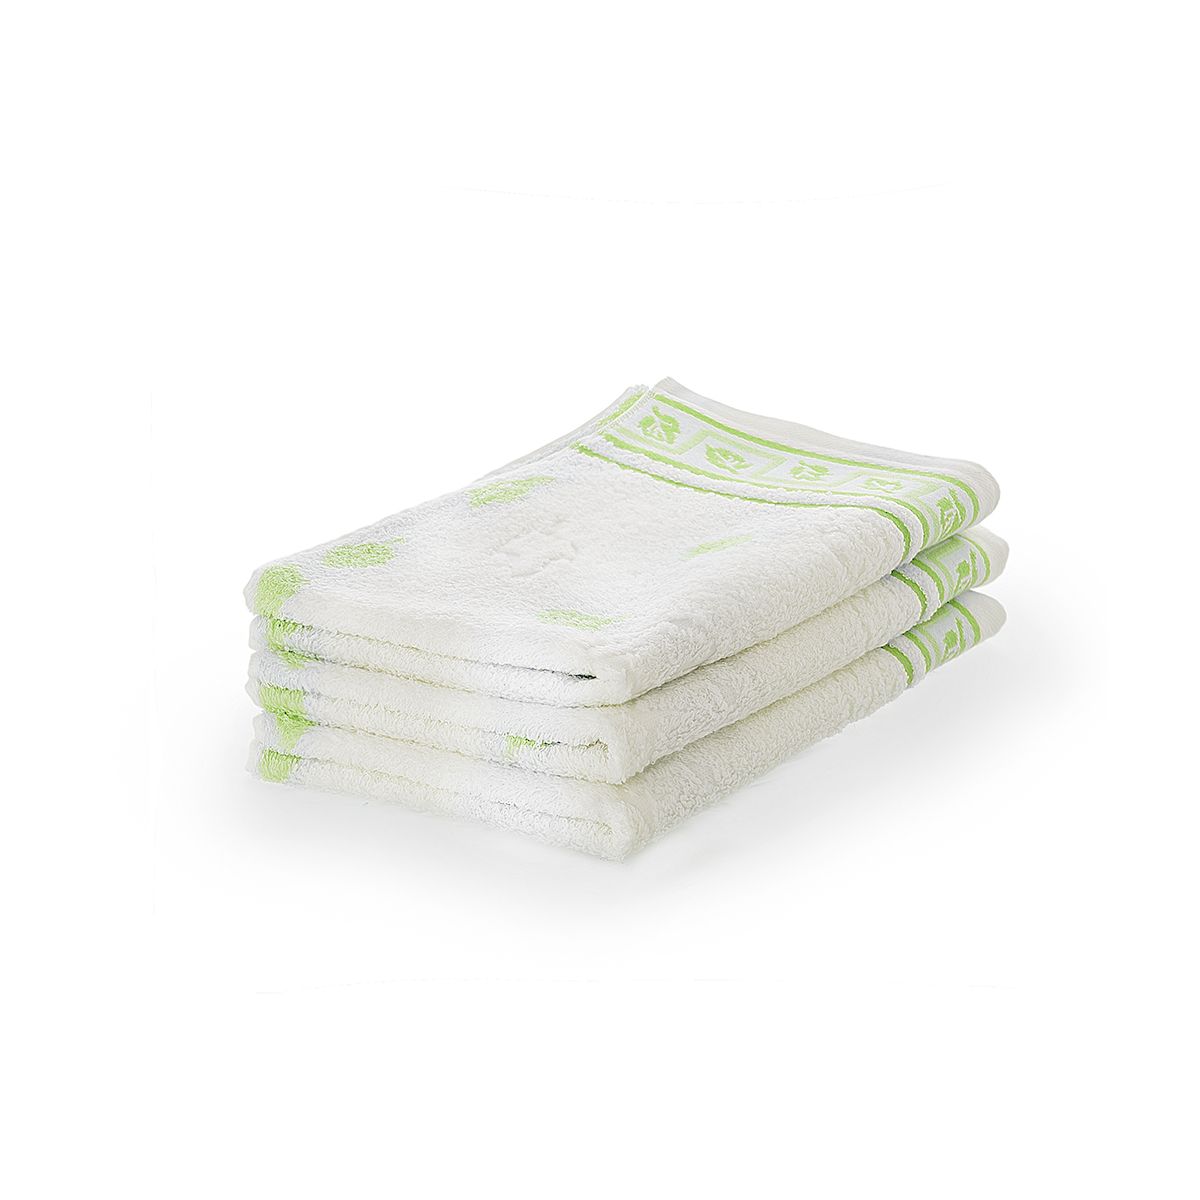 Полотенце Листопад Зеленый, размер 34х78 смМахровые полотенца<br>Плотность ткани: 480 г/кв. м.<br><br>Тип: Полотенце<br>Размер: 34х78<br>Материал: Махра